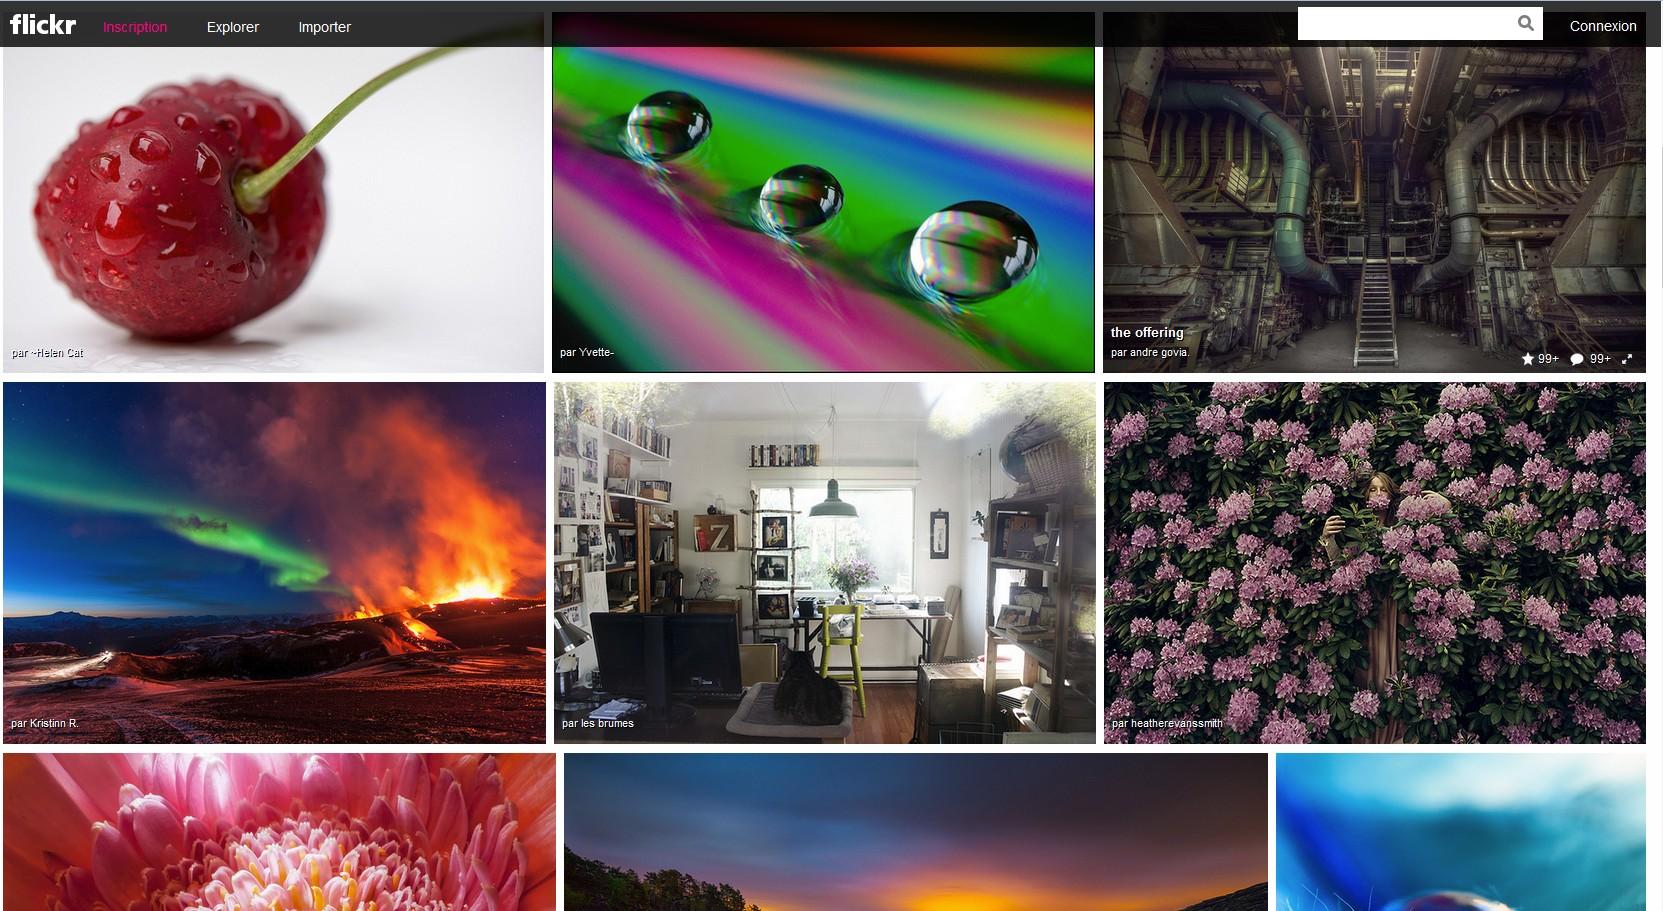 Flickr nouvelle interface